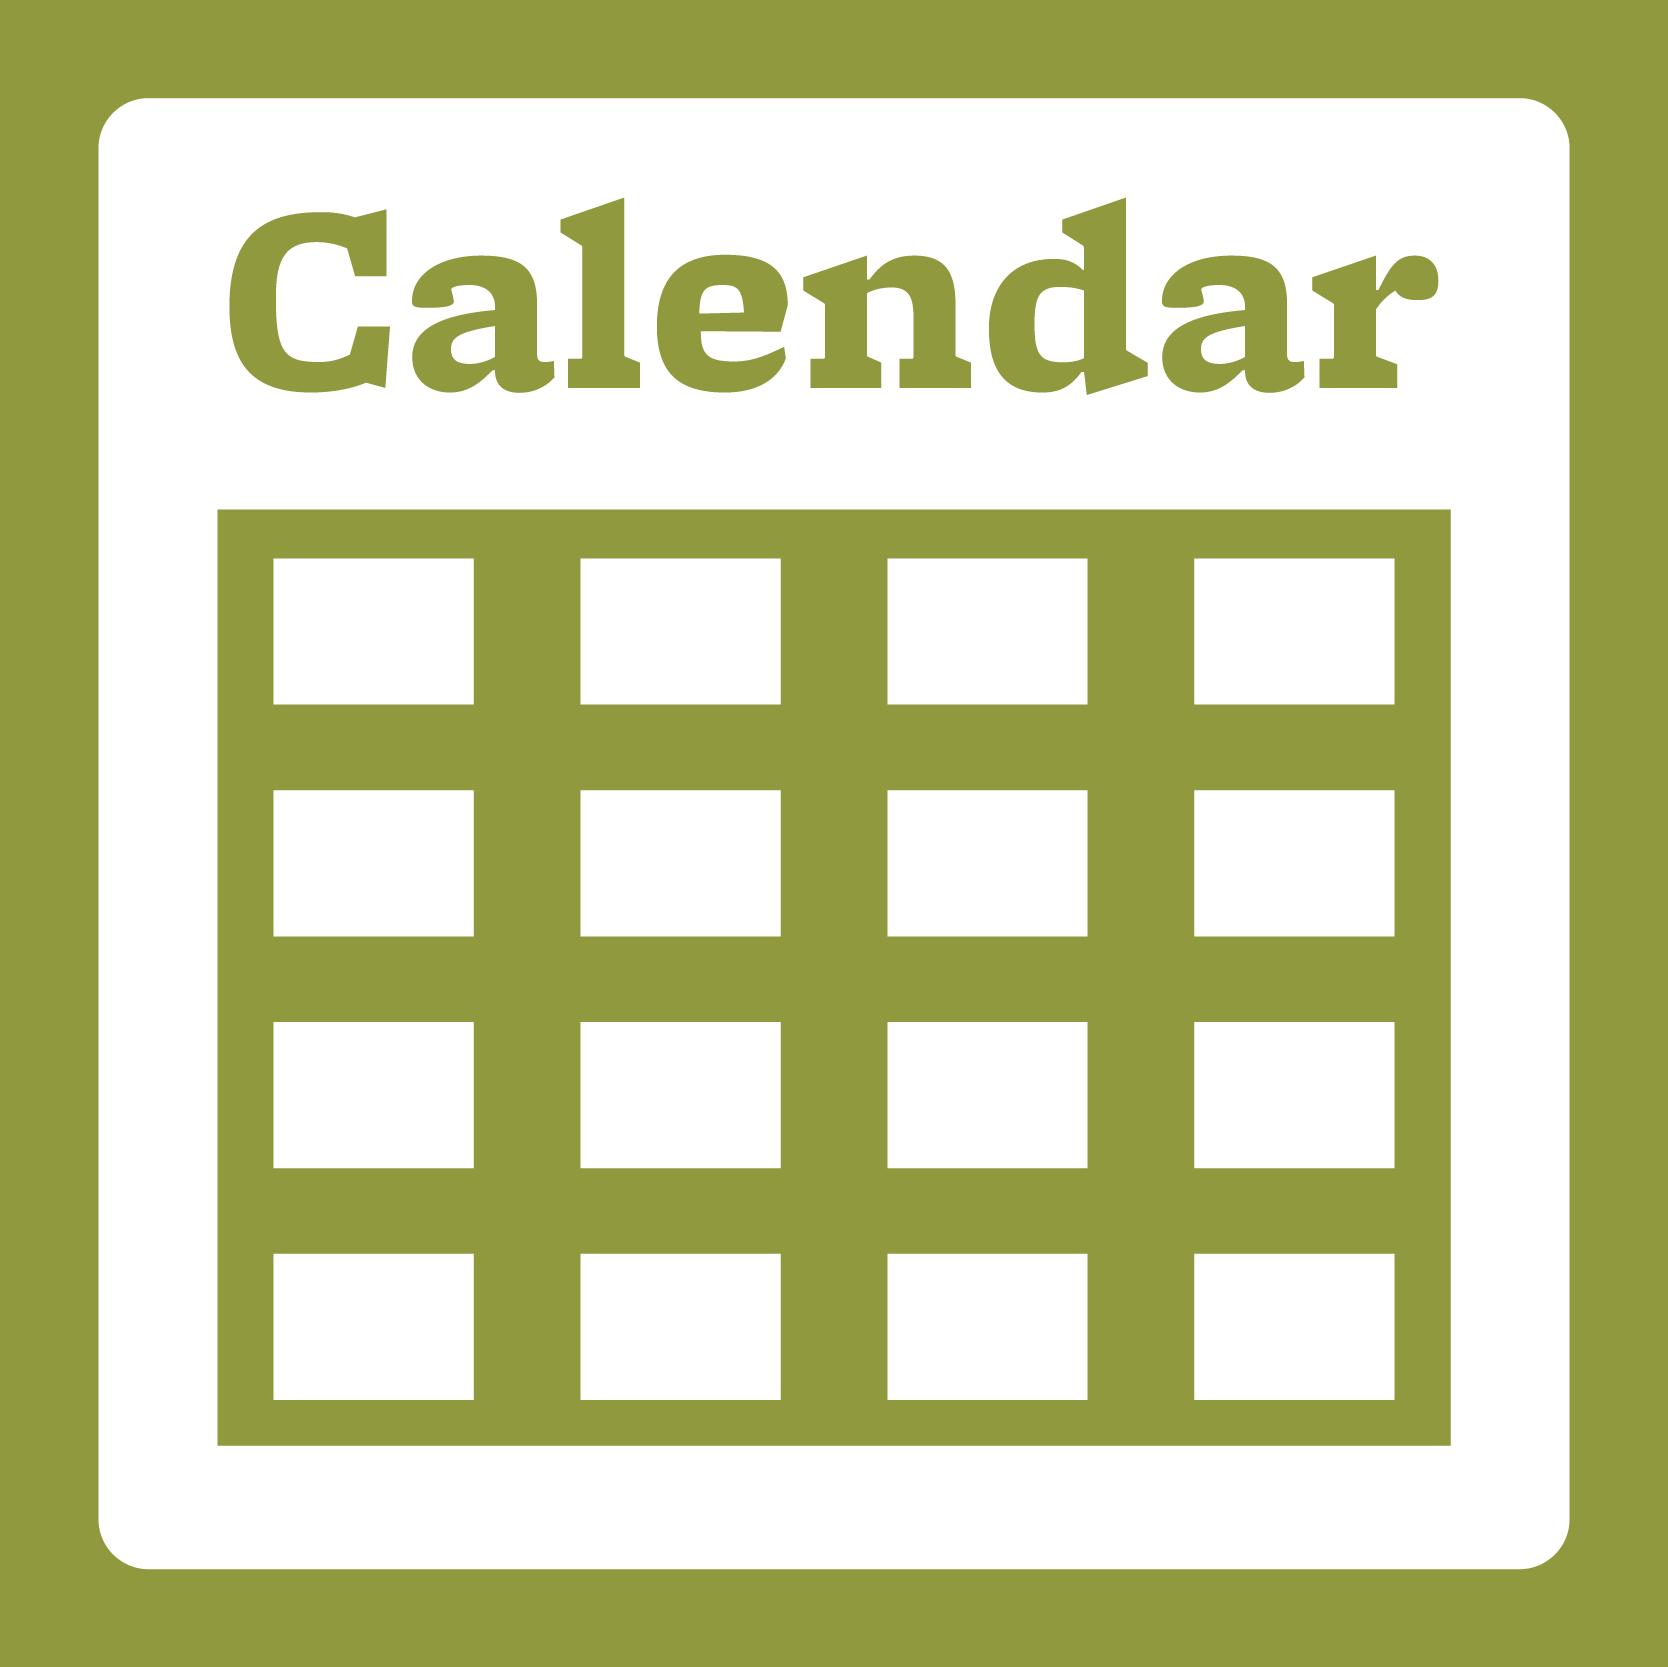 View our Calendar